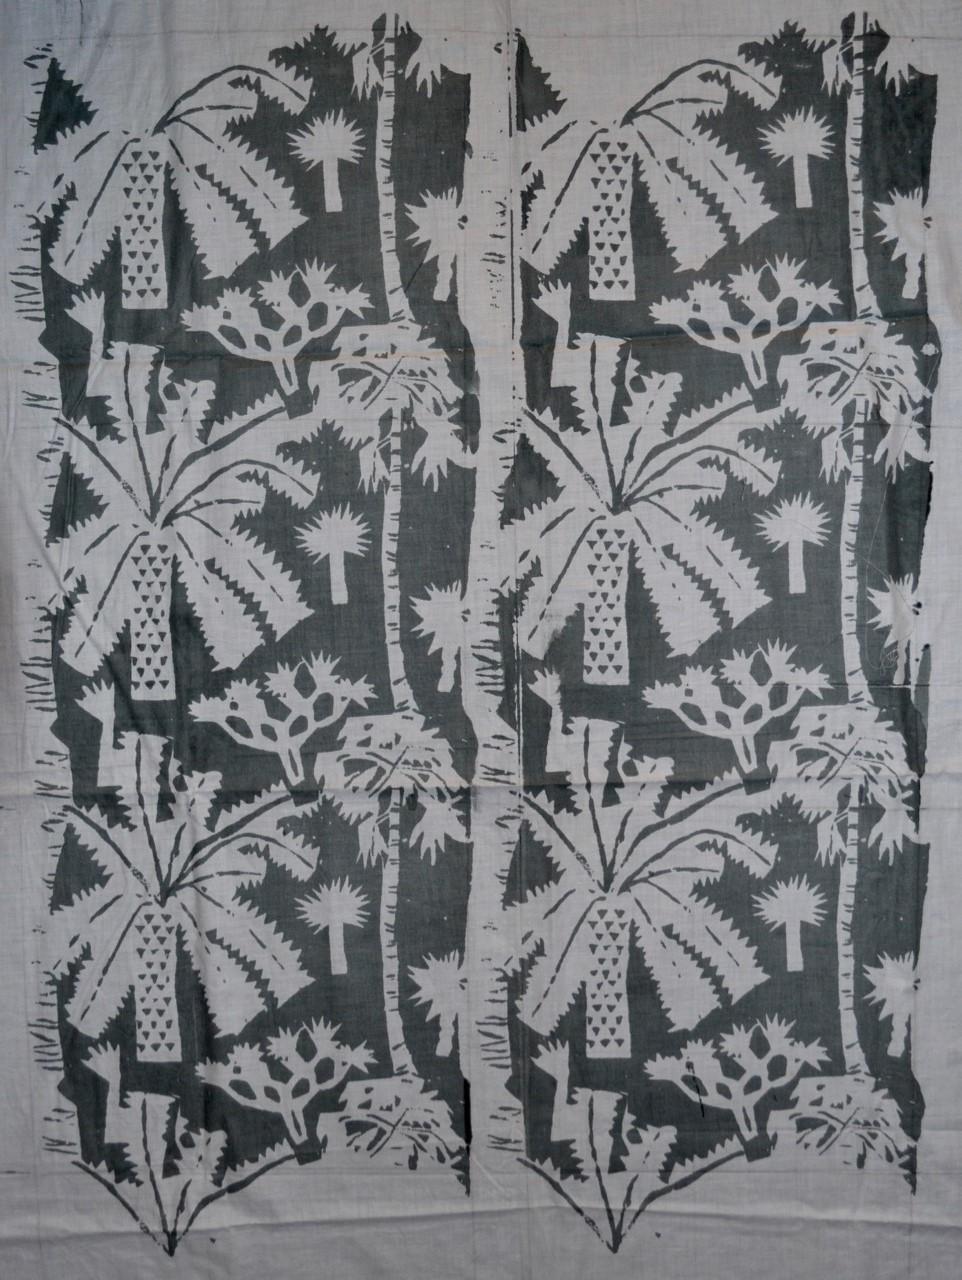 Helen Grey-Smith,  Palm Trees , 1960s, screen-print on cotton, design 25 x 20 cm. Collection of Grey-Smith Estate. Photograph by David Porter. Courtesy Grey-Smith Estate.